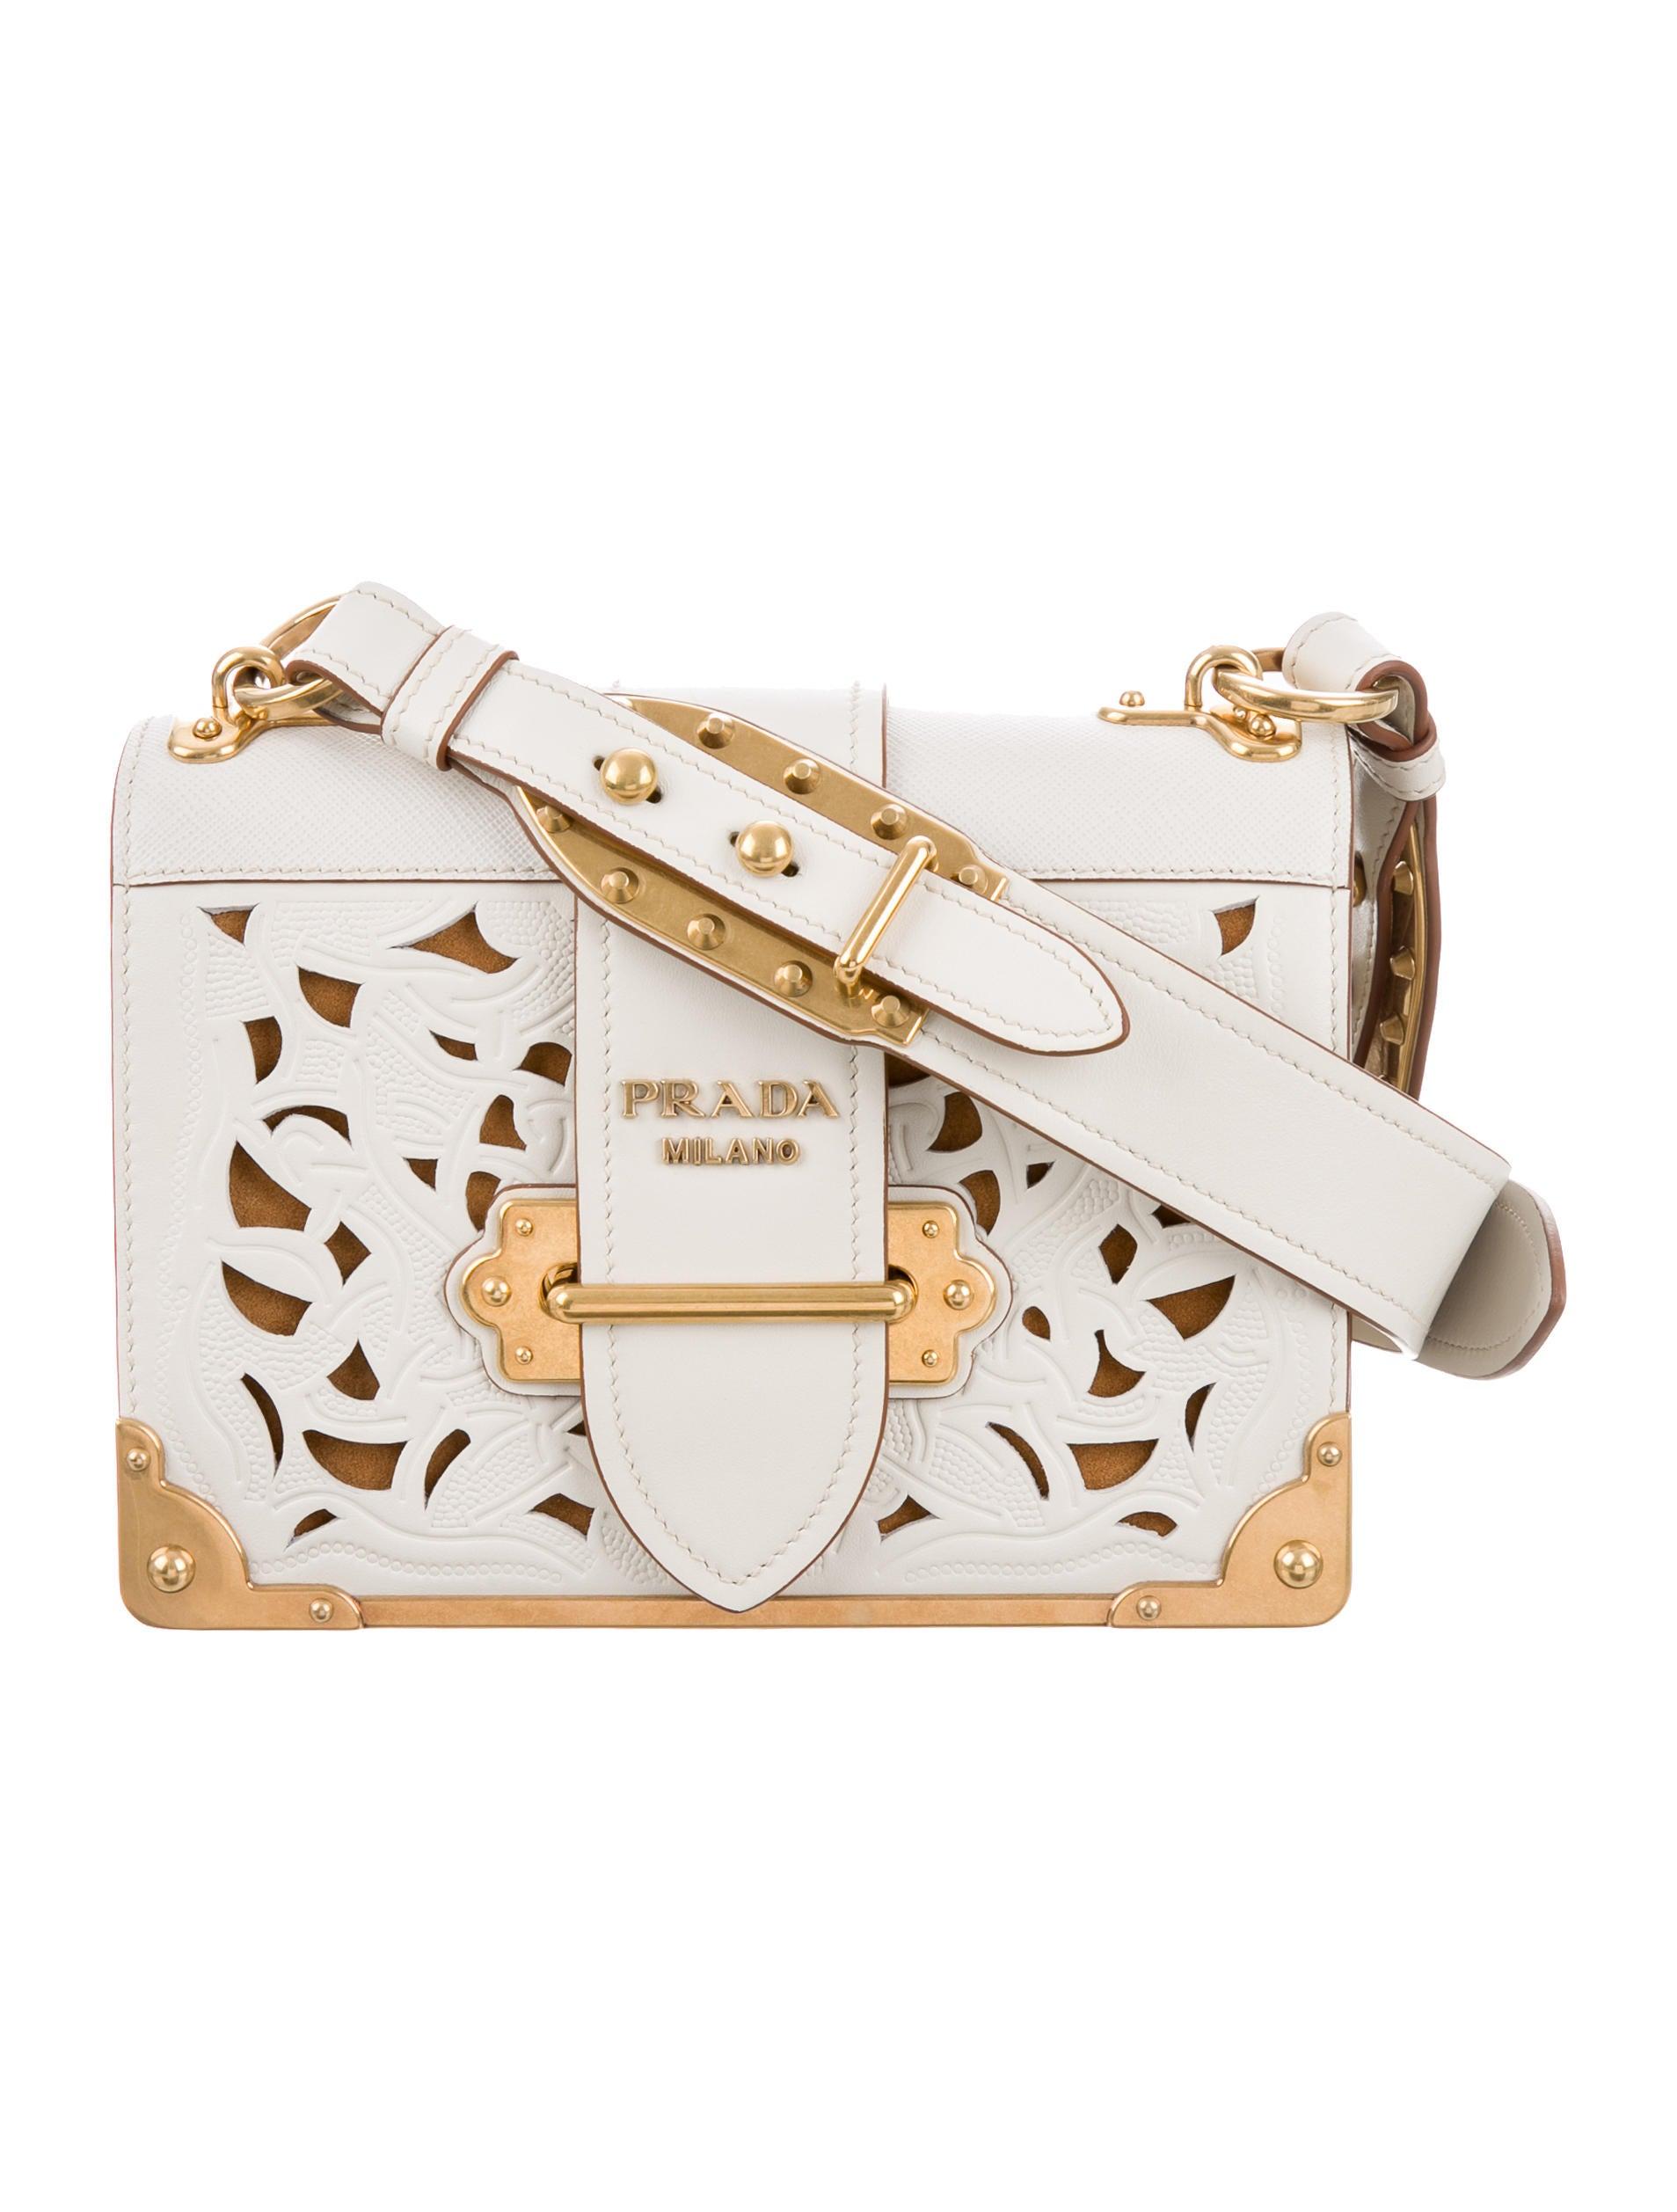 dd13d6837c48 Prada 2017 Laser-Cut Cahier Shoulder Bag - Handbags - PRA129396 ...